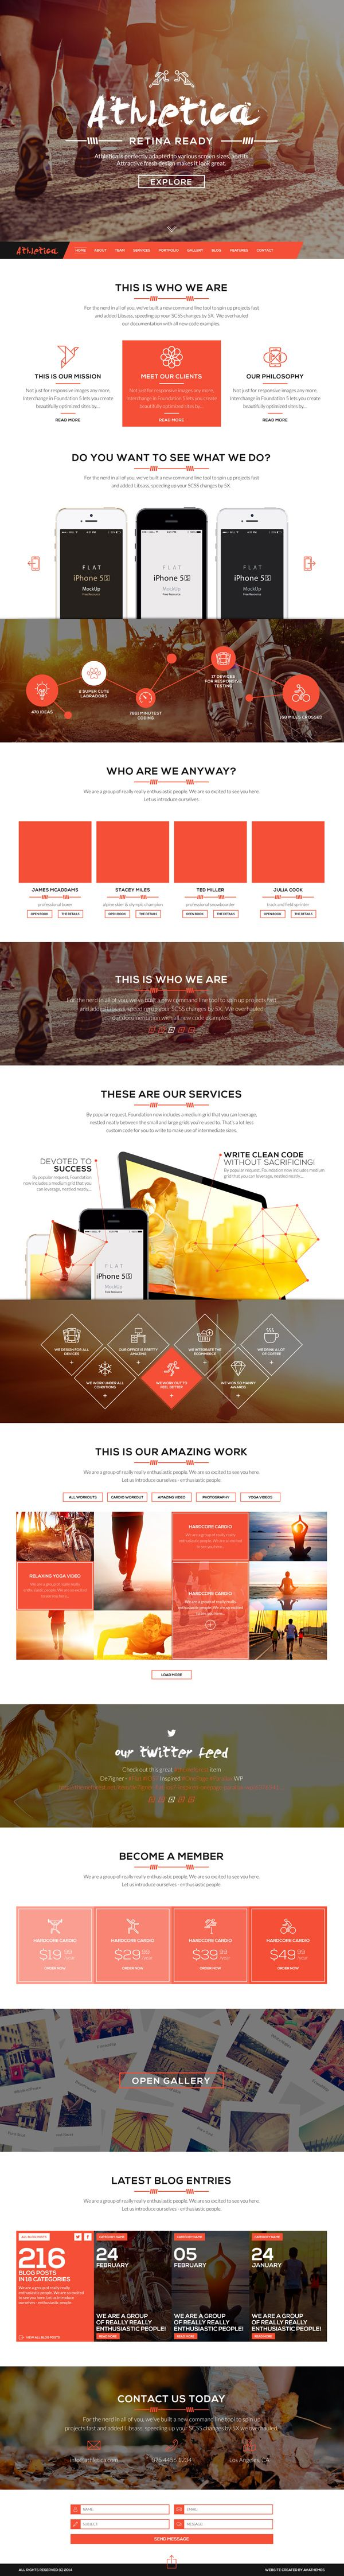 Athletica - Retina Parallax OnePage WP Shop Theme #html5themes #responsivewordpressthemes #responsivedesign #html5 #css3